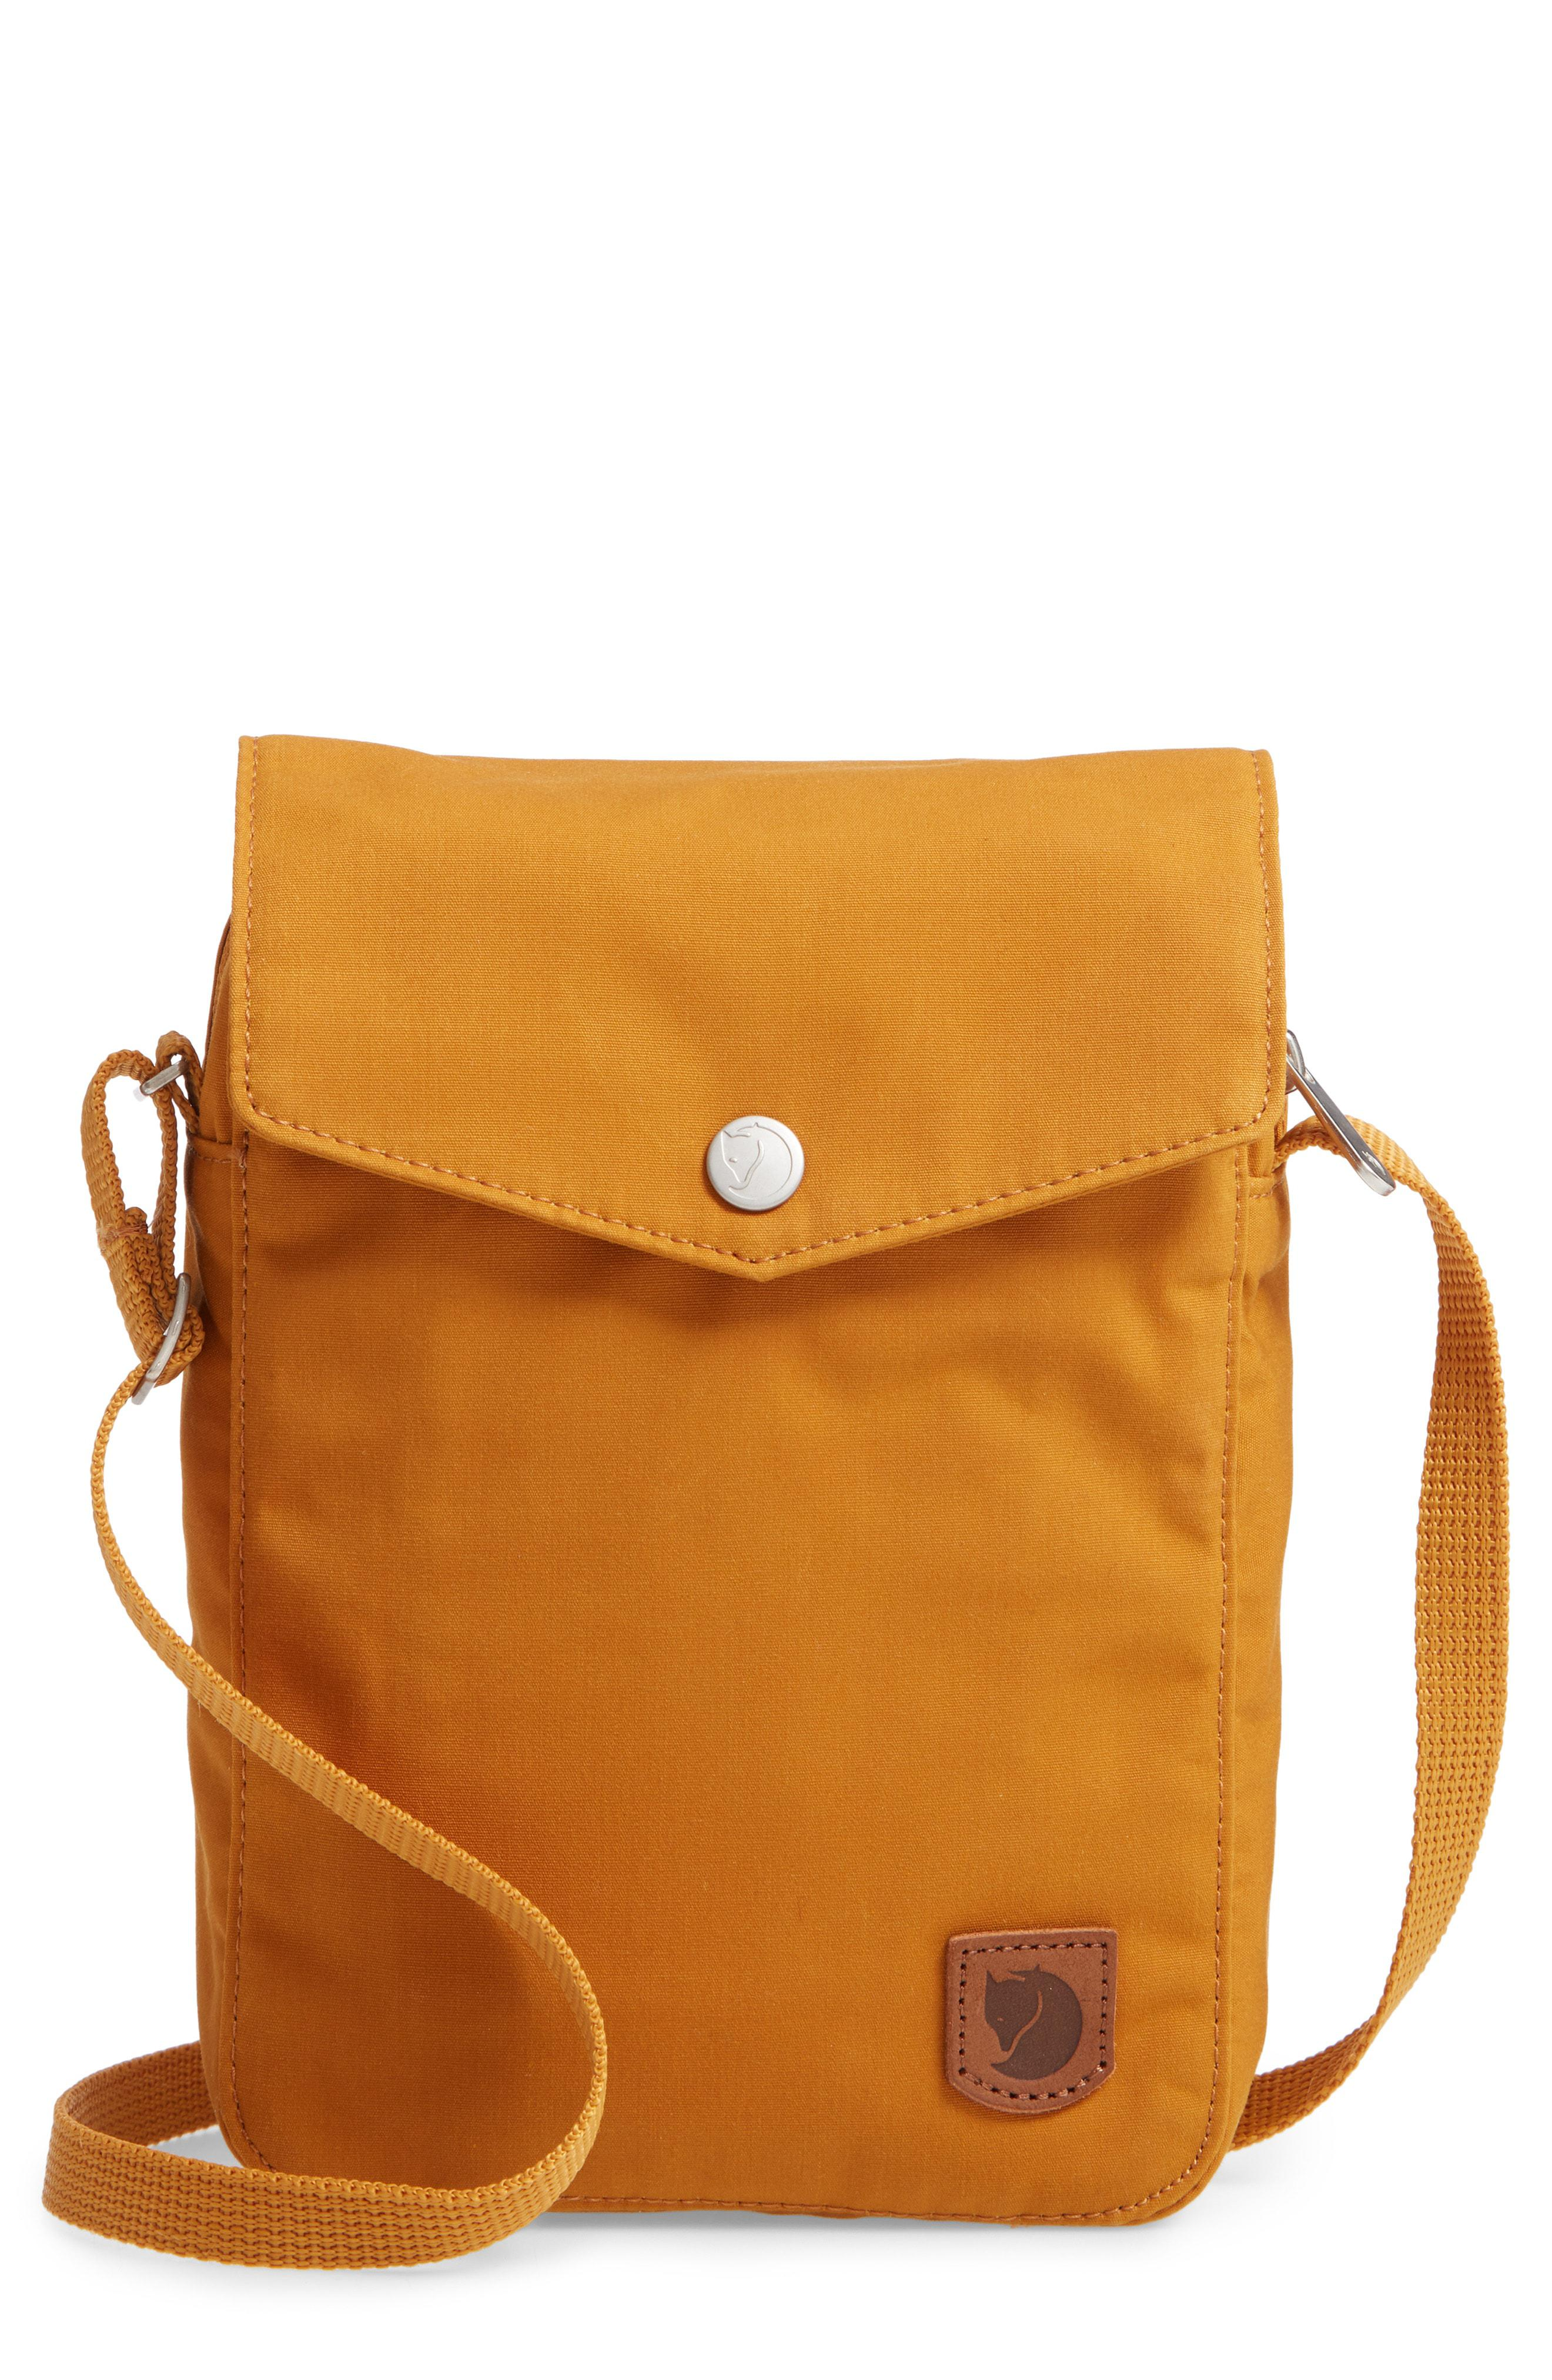 Lyst - Fjallraven Greenland Pocket Crossbody Bag - in Orange 02146ebc1a247